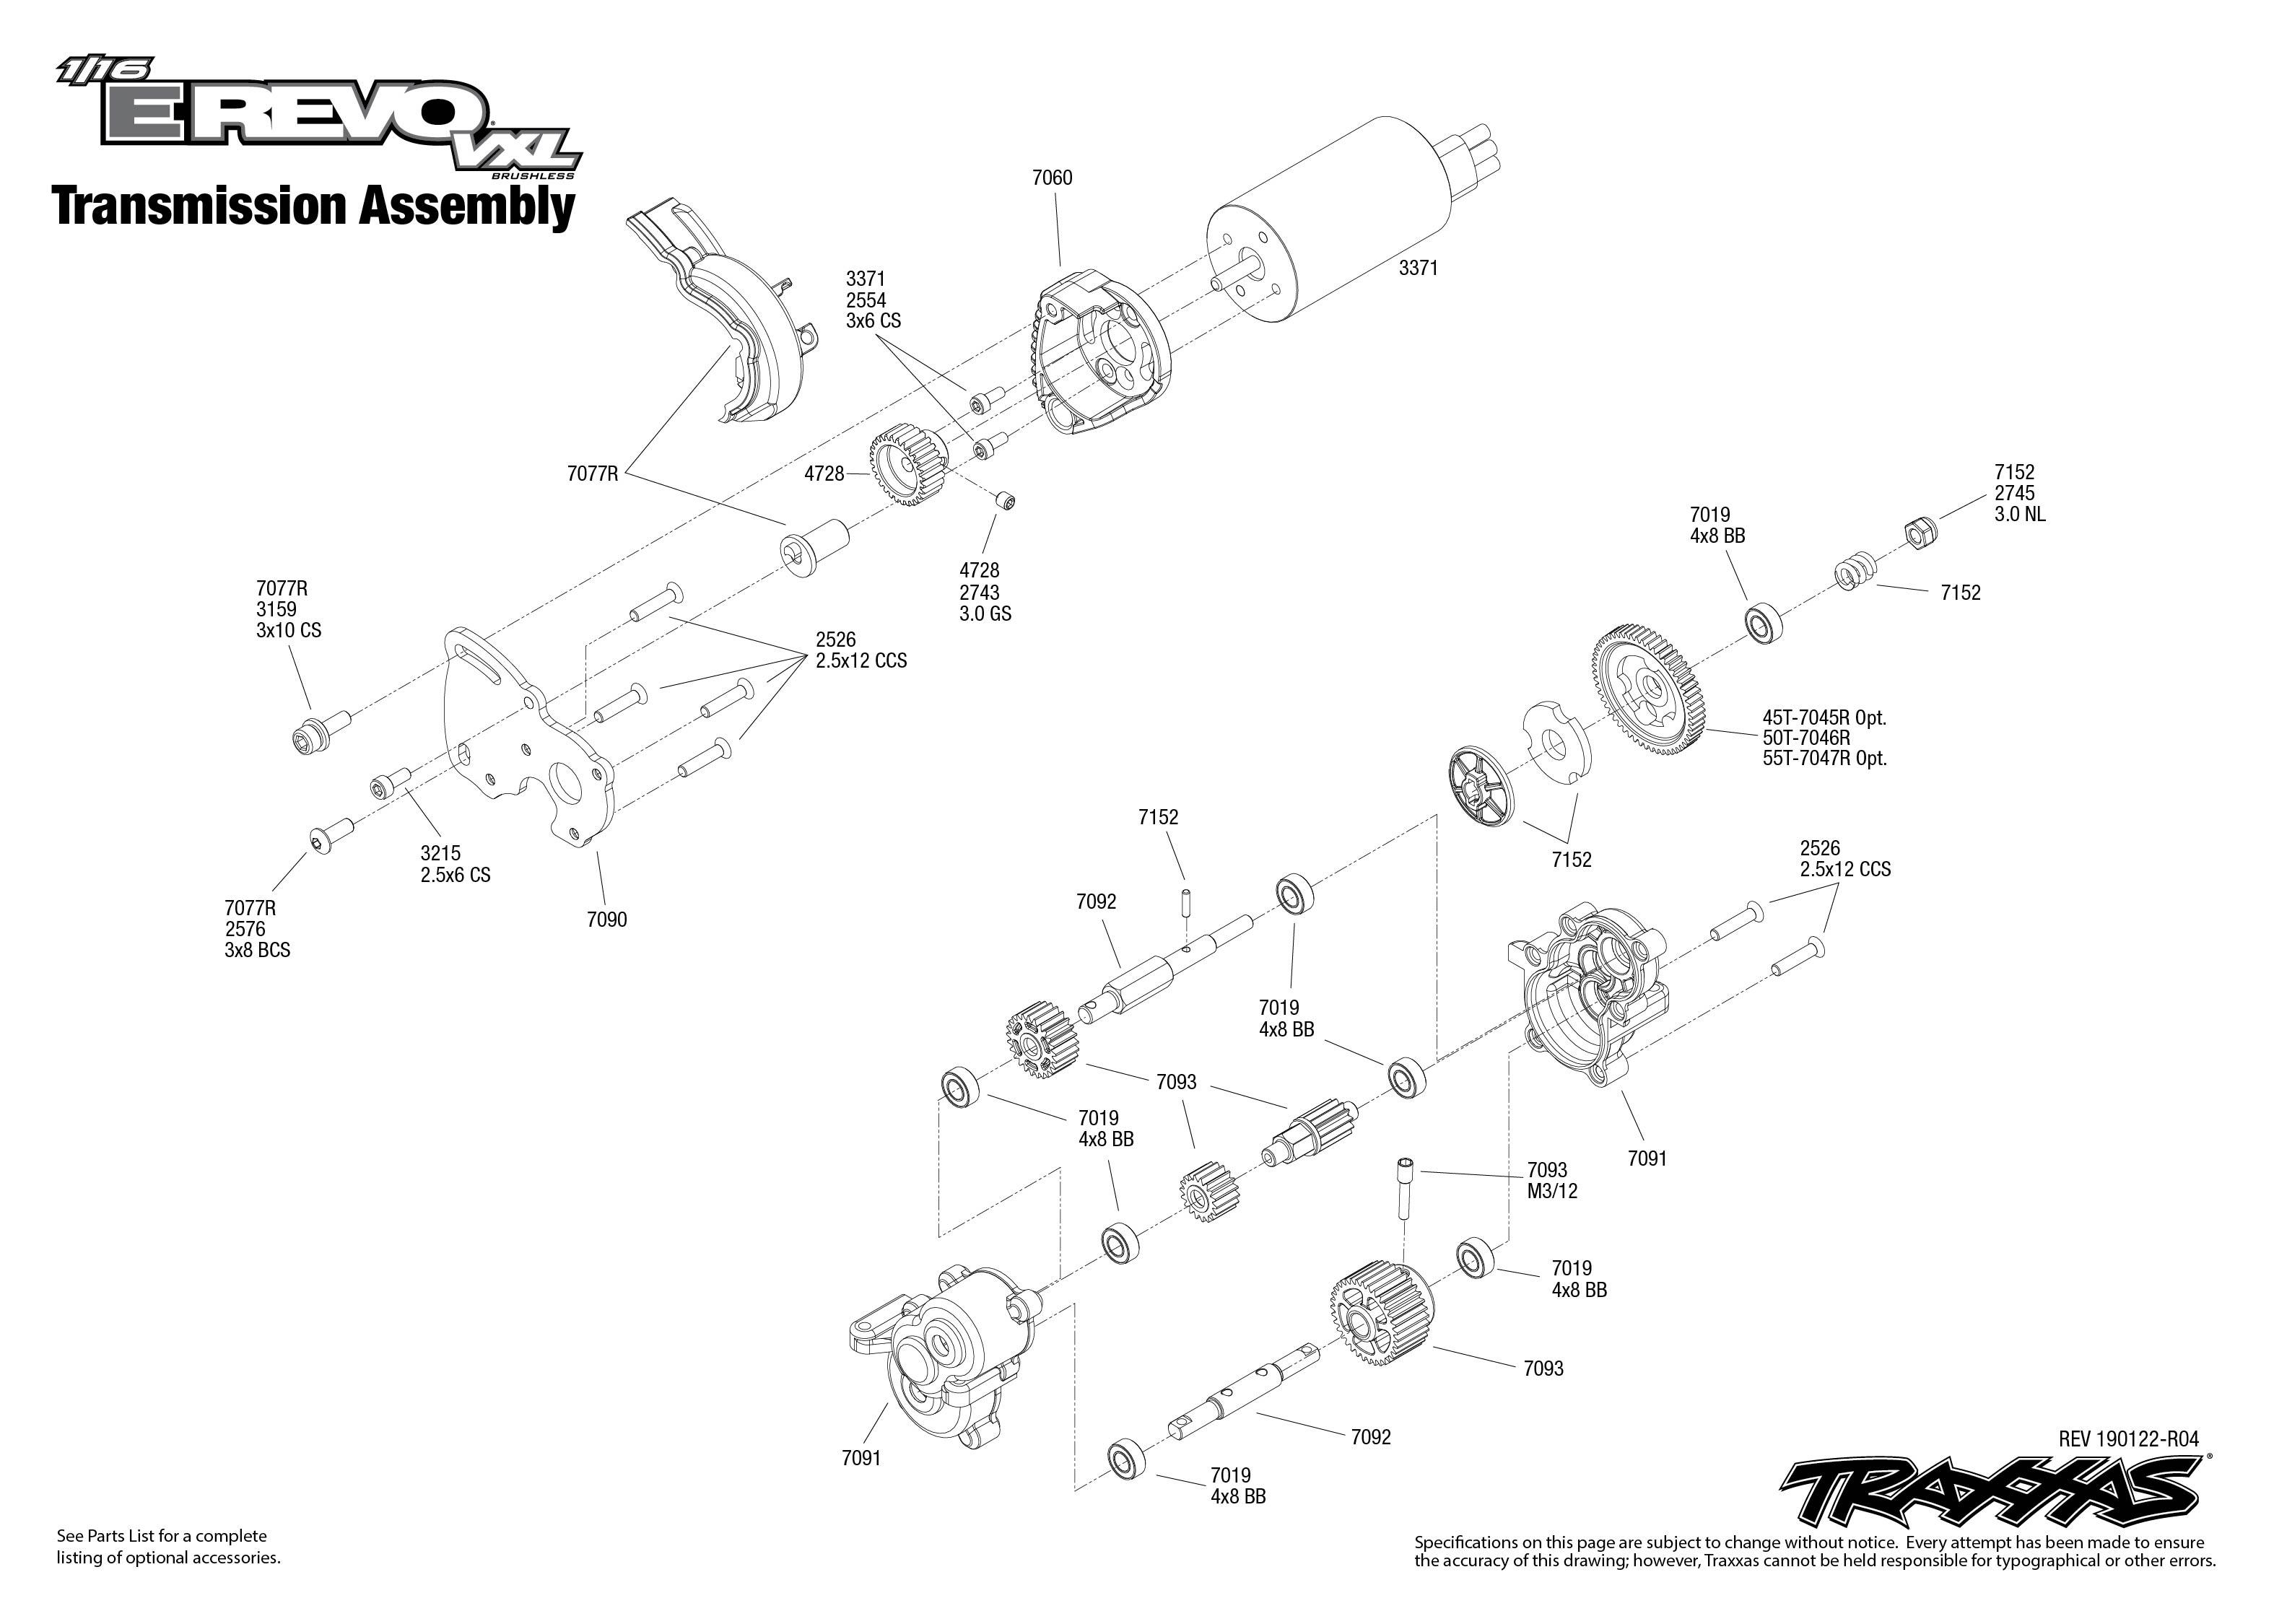 1/16 E-Revo VXL (71076-3) Transmission Assembly Exploded